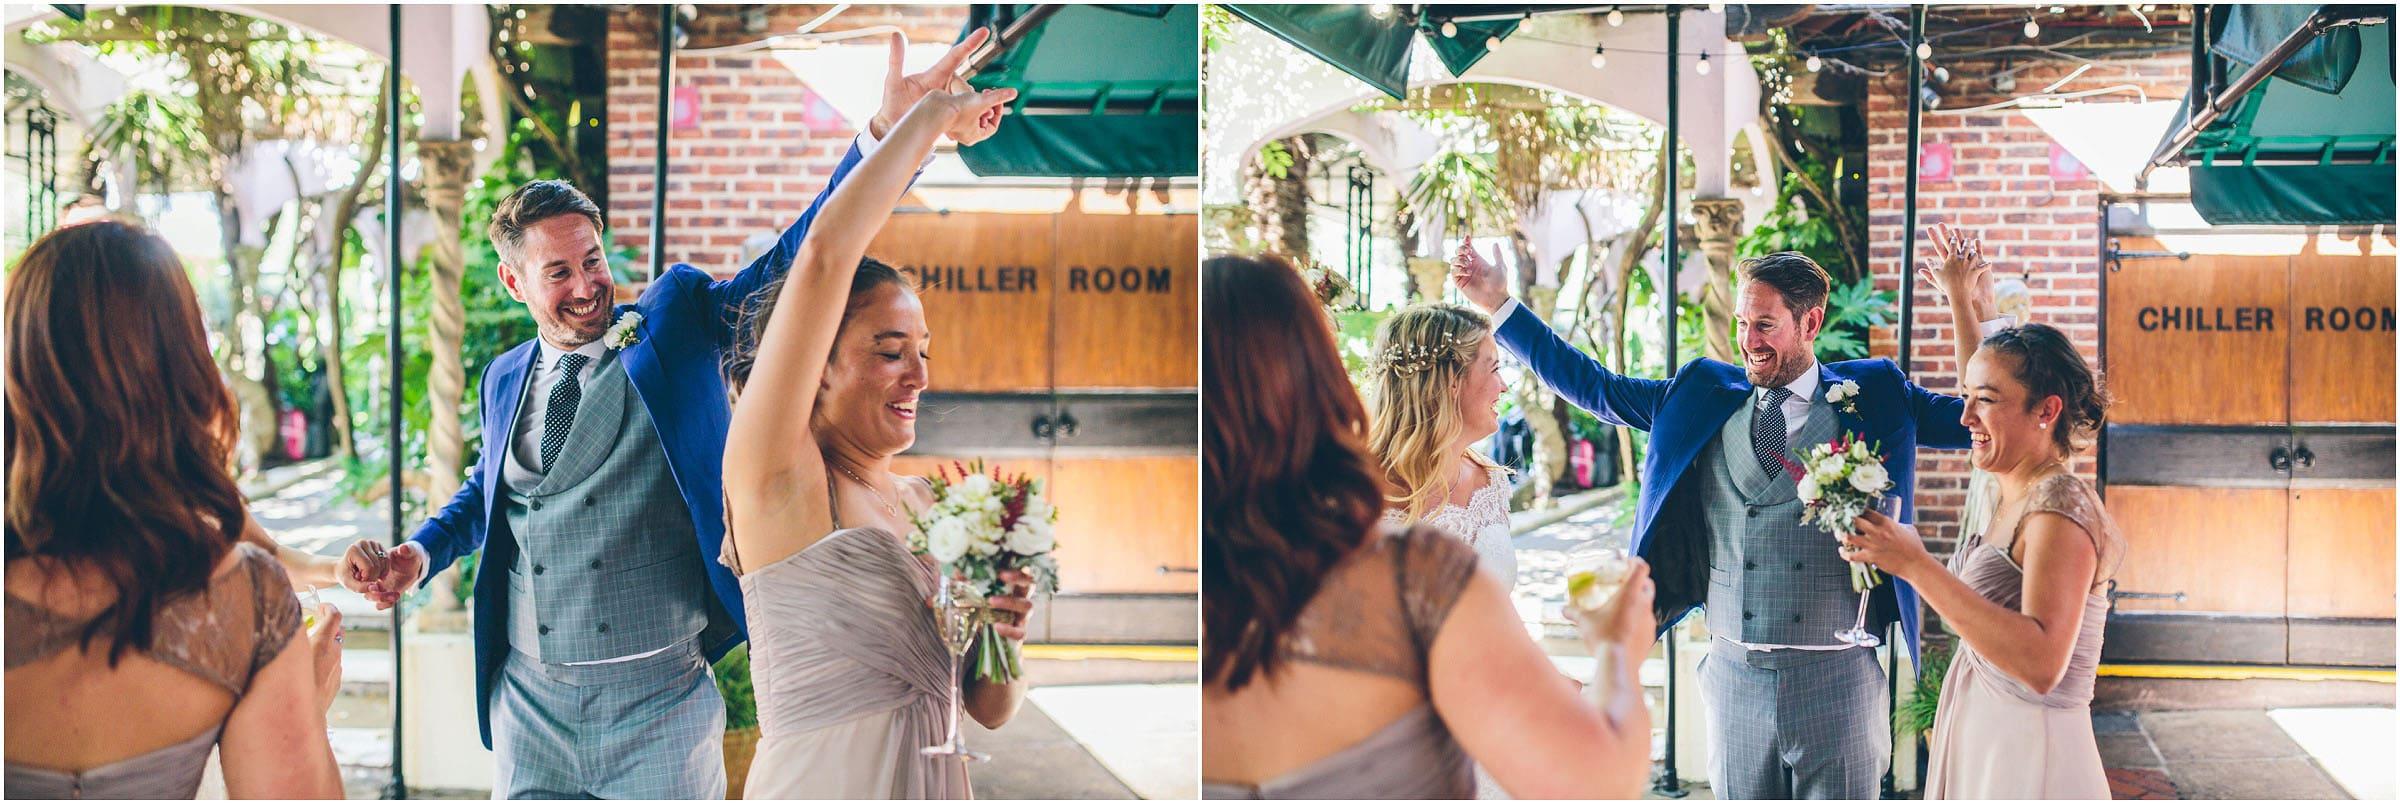 Kensington_Roof_Gardens_Wedding_Photography_0059